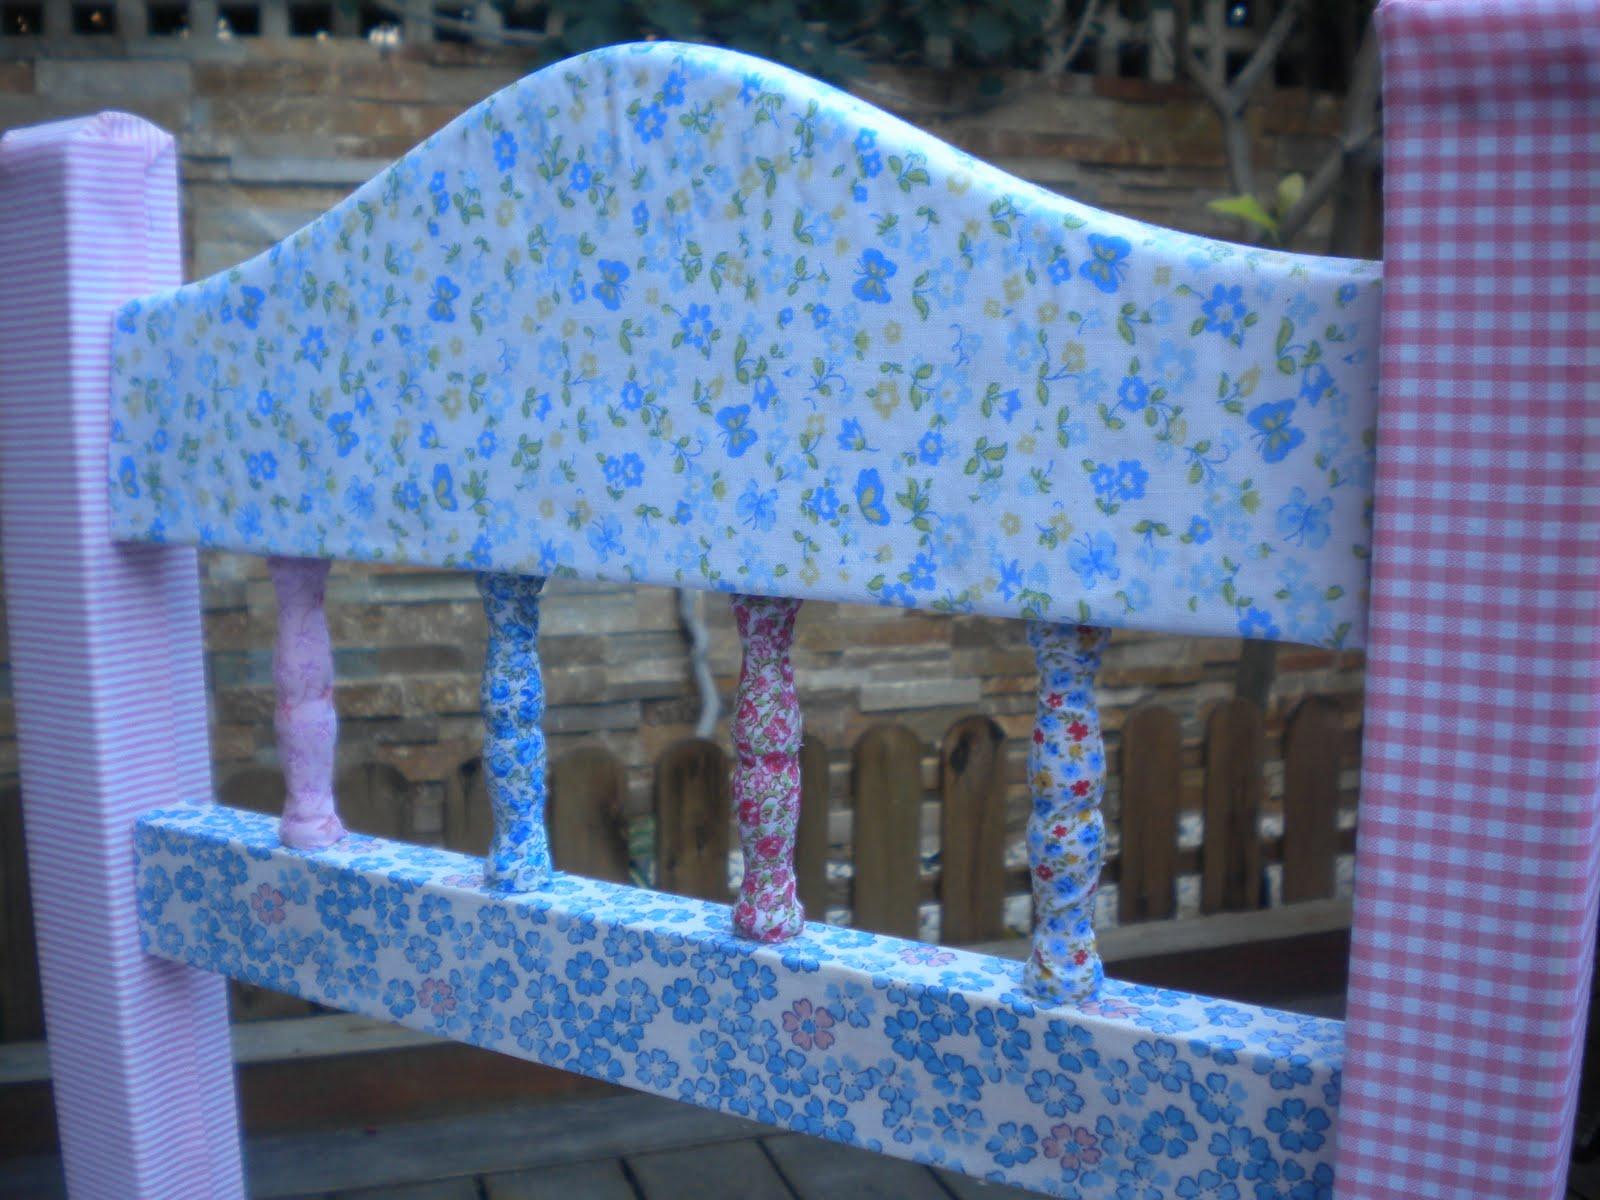 au jardin de chlo chaise liberty silla liberty. Black Bedroom Furniture Sets. Home Design Ideas